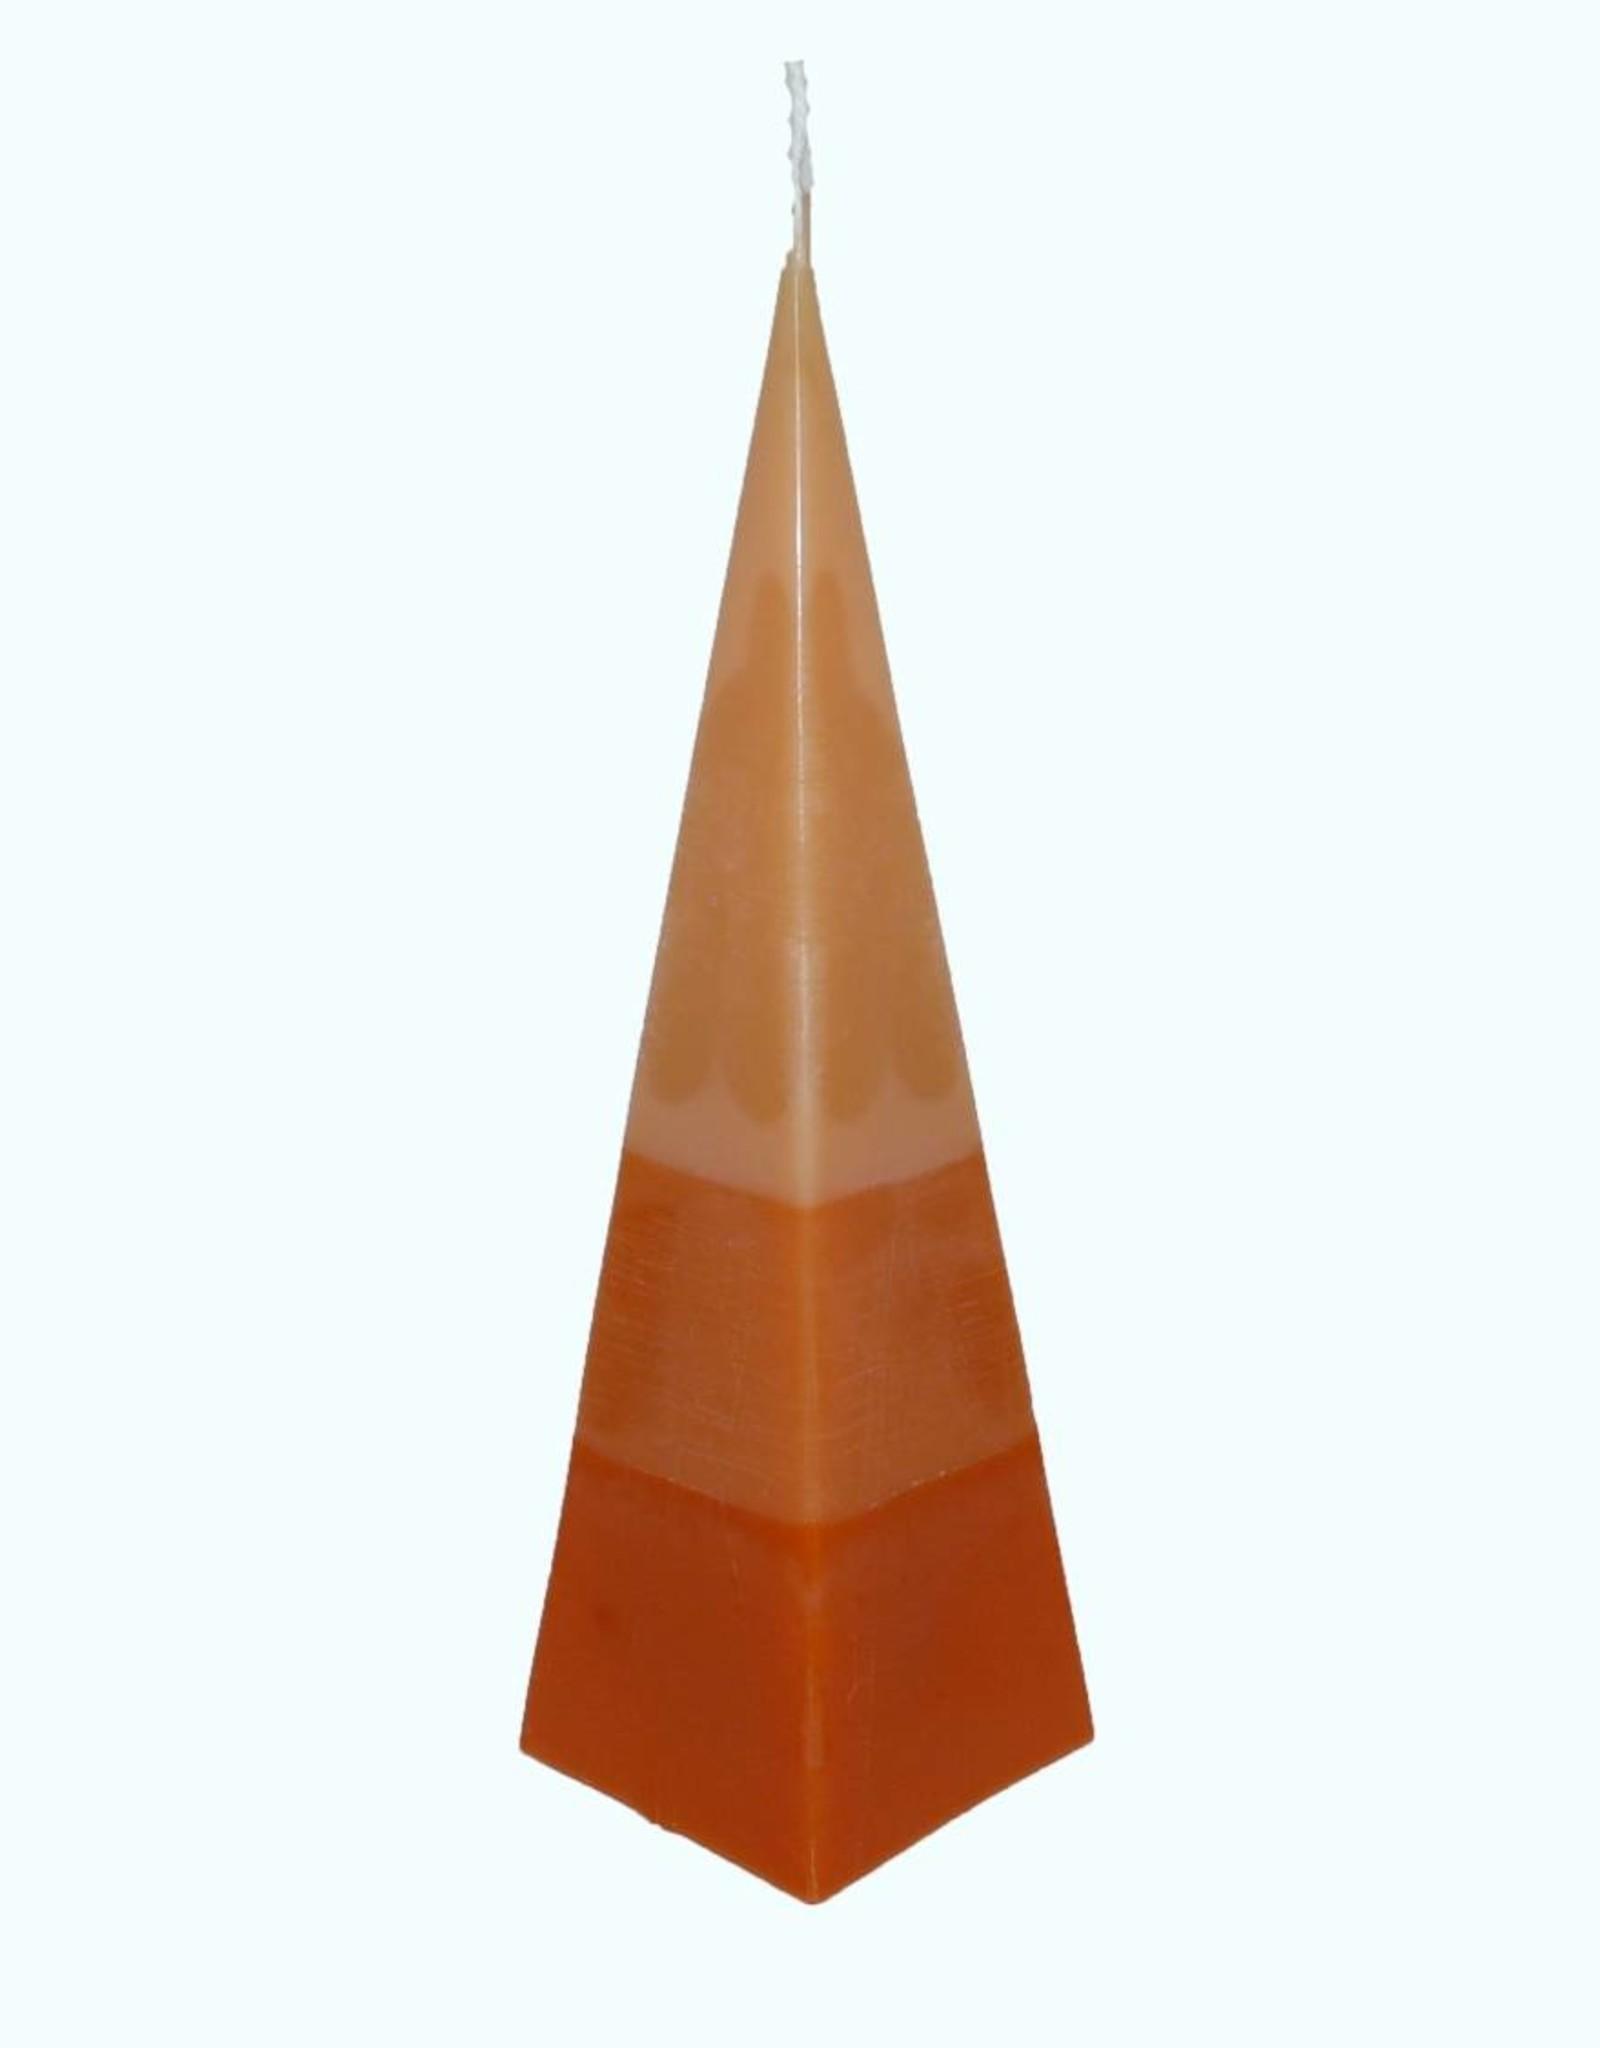 Kaars Piramide TriColor Oranje 6x6x23 cm